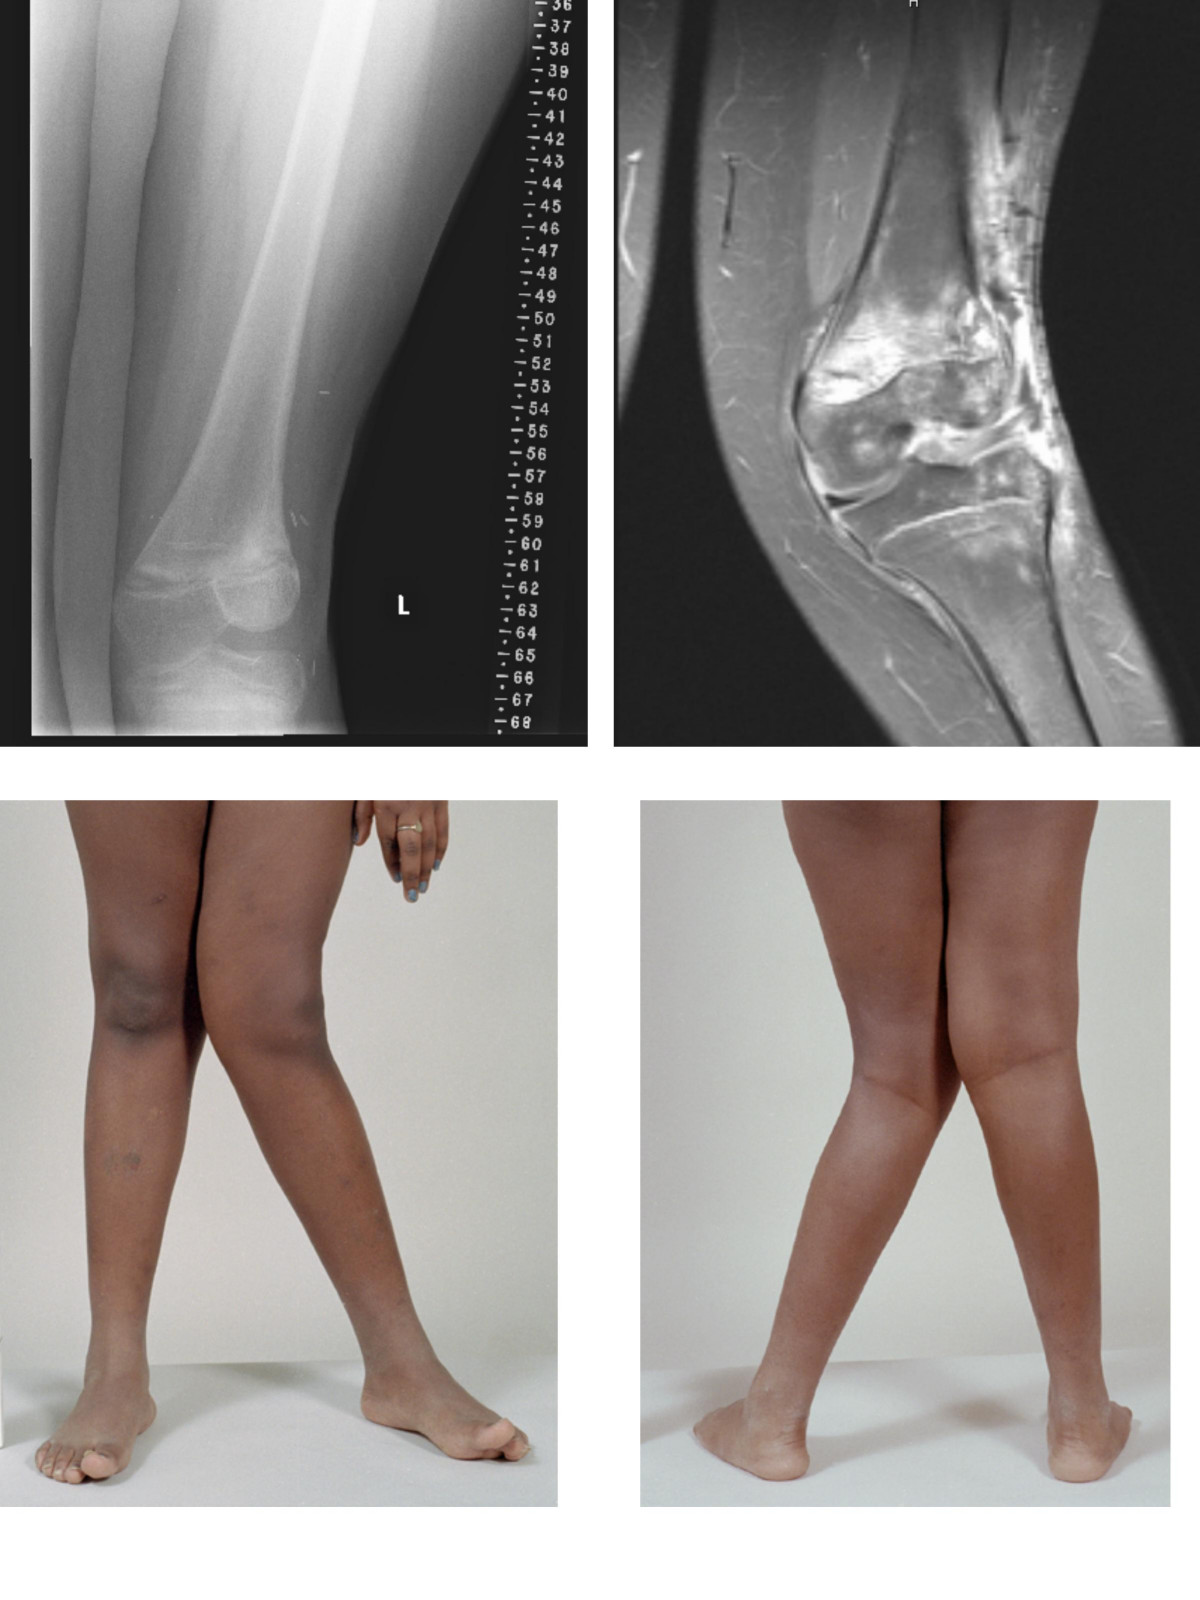 Valgus and varus deformity after wide-local excision